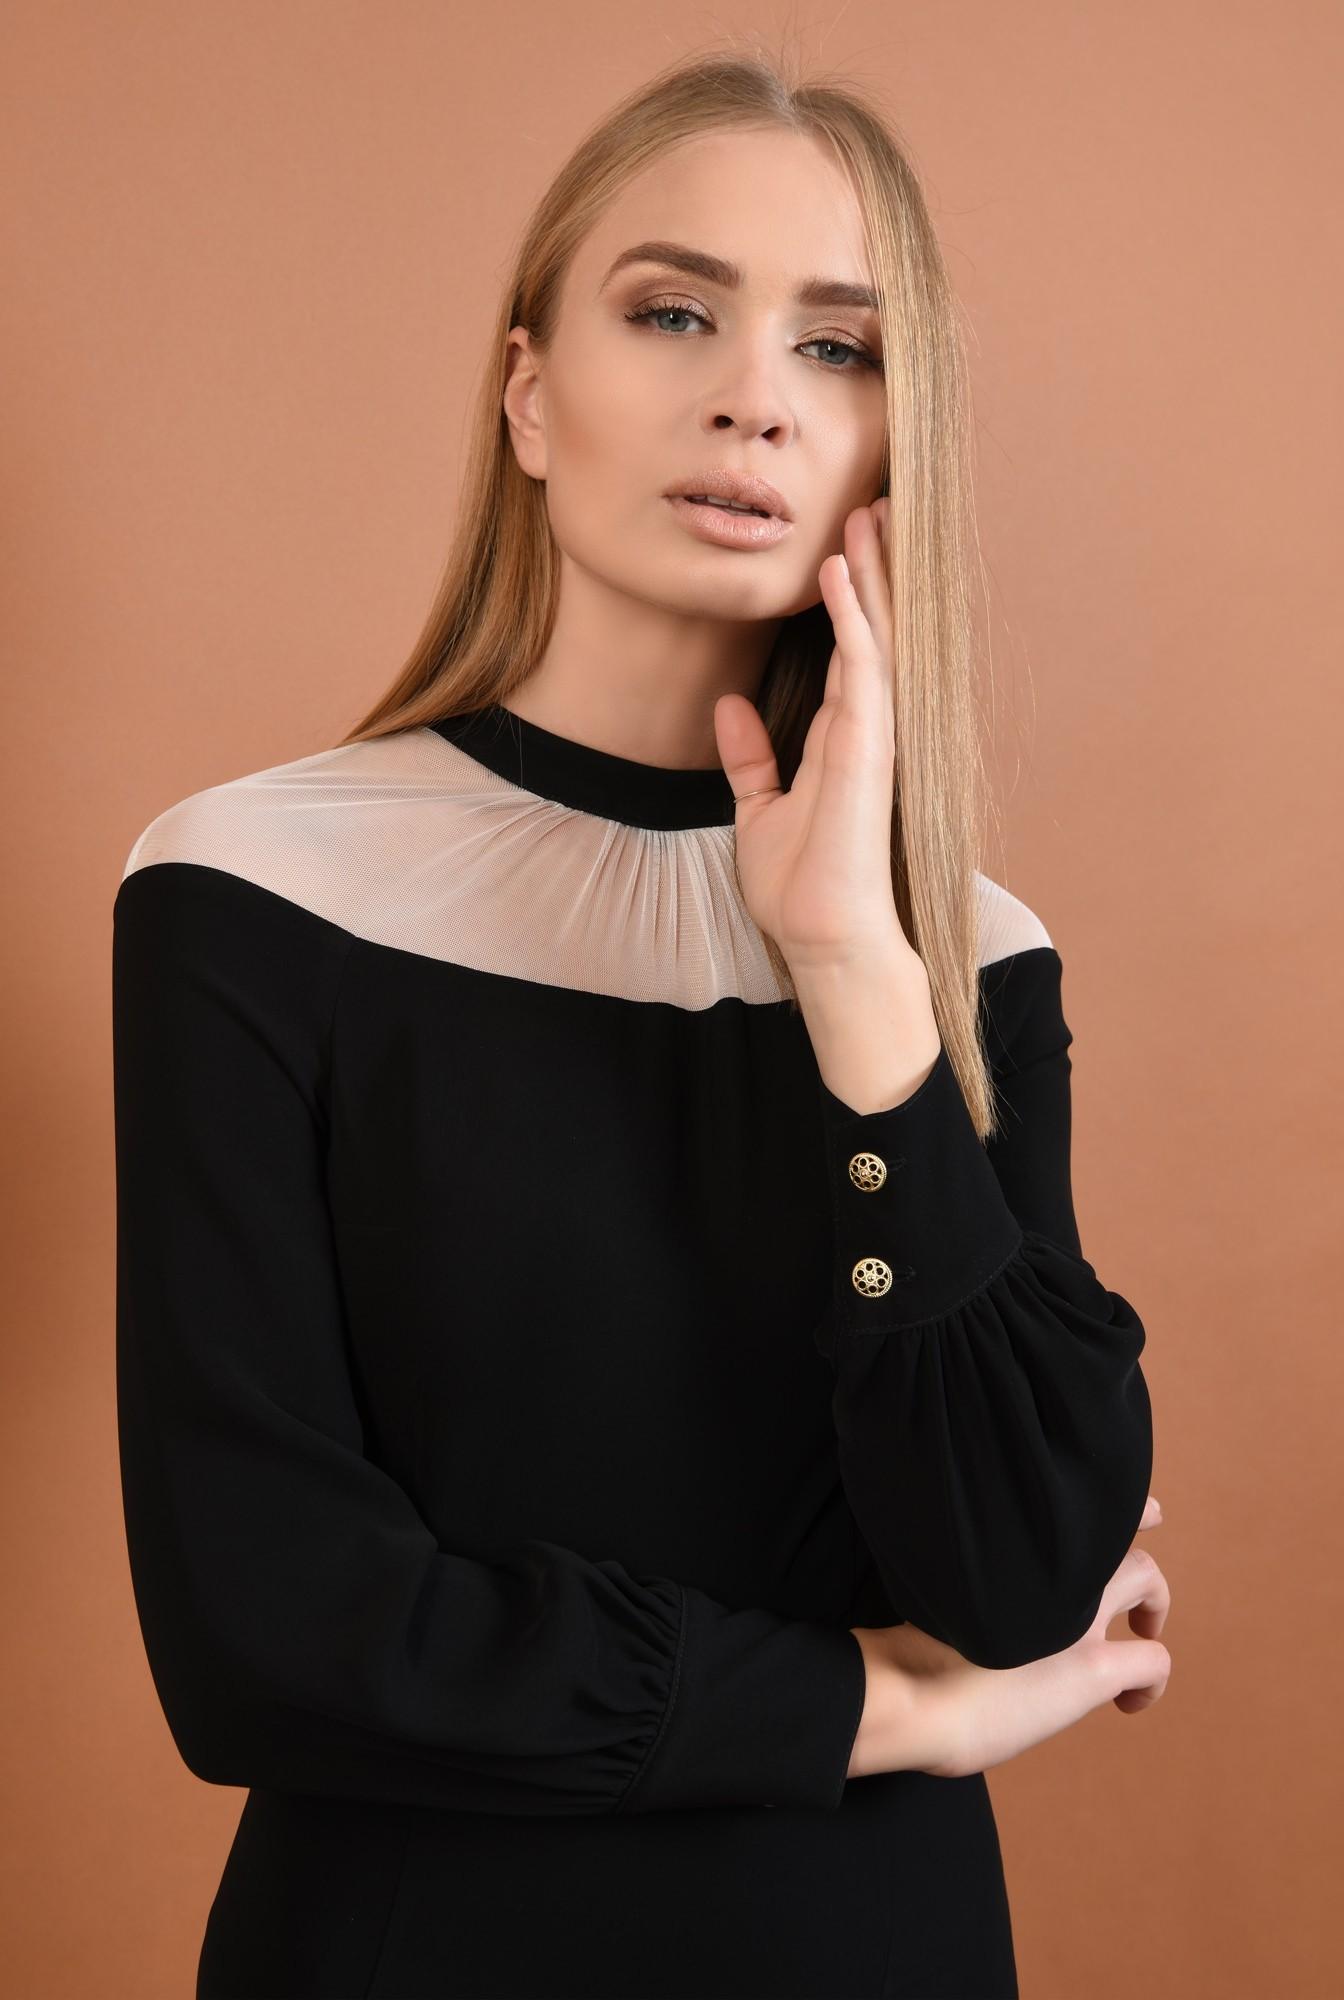 2 - 360 - rochie eleganta, midi, conica, neagra, insertie tul, nasturi metalici